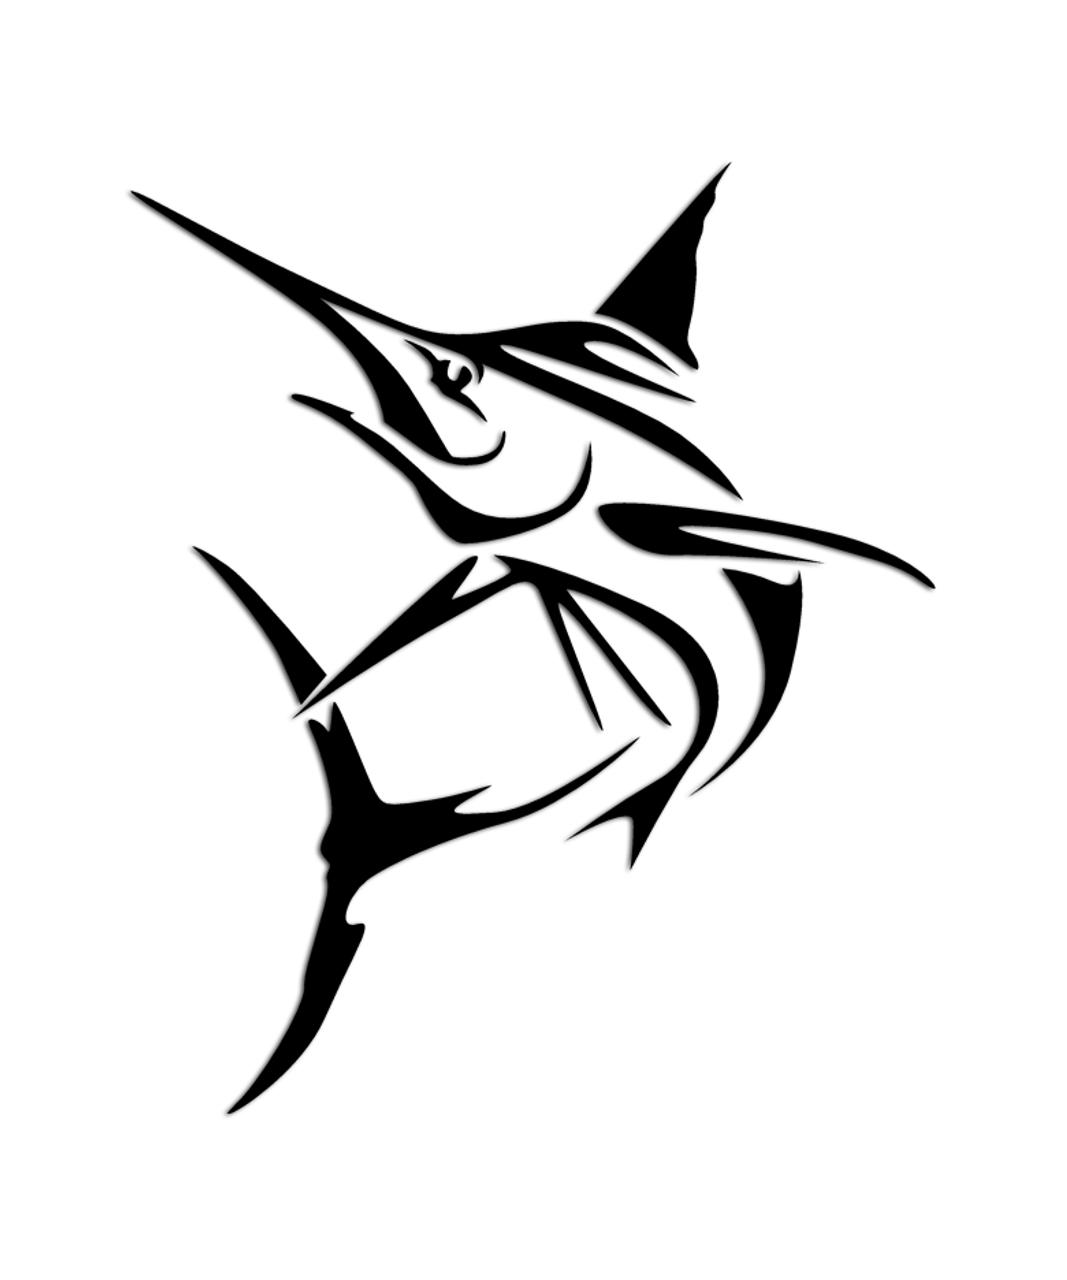 Marlin tribal fishing sticker